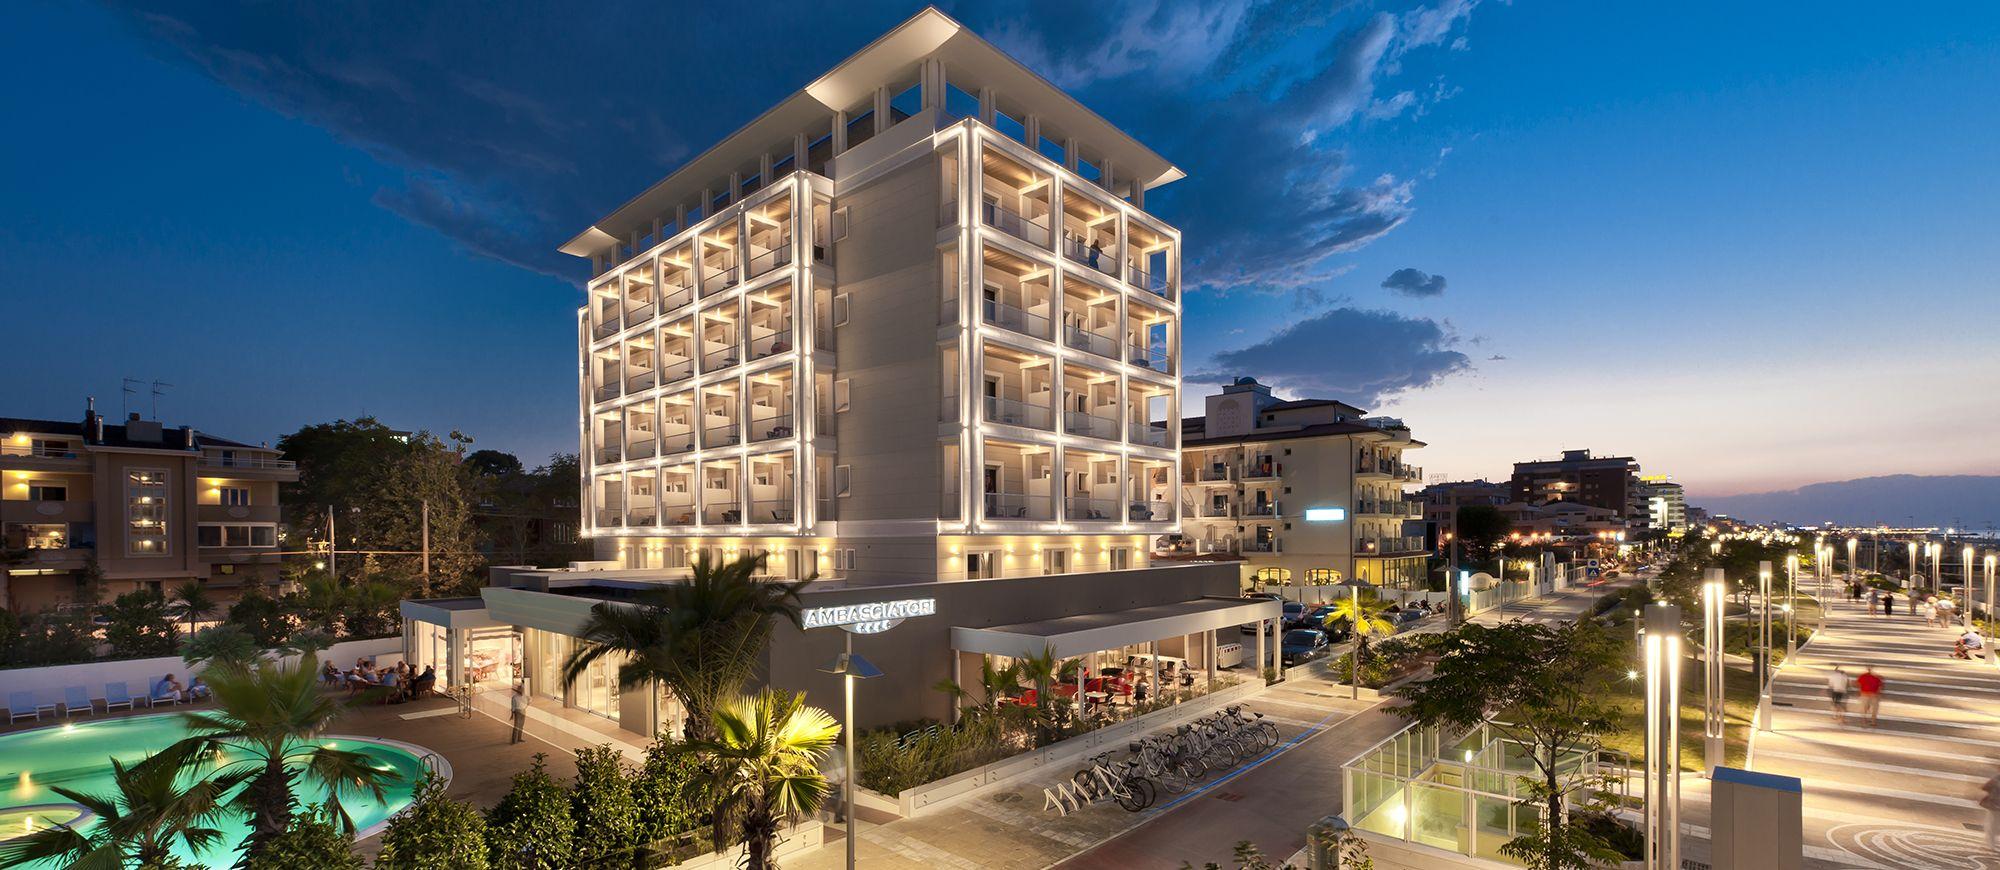 Hotel Rimini X Bambini